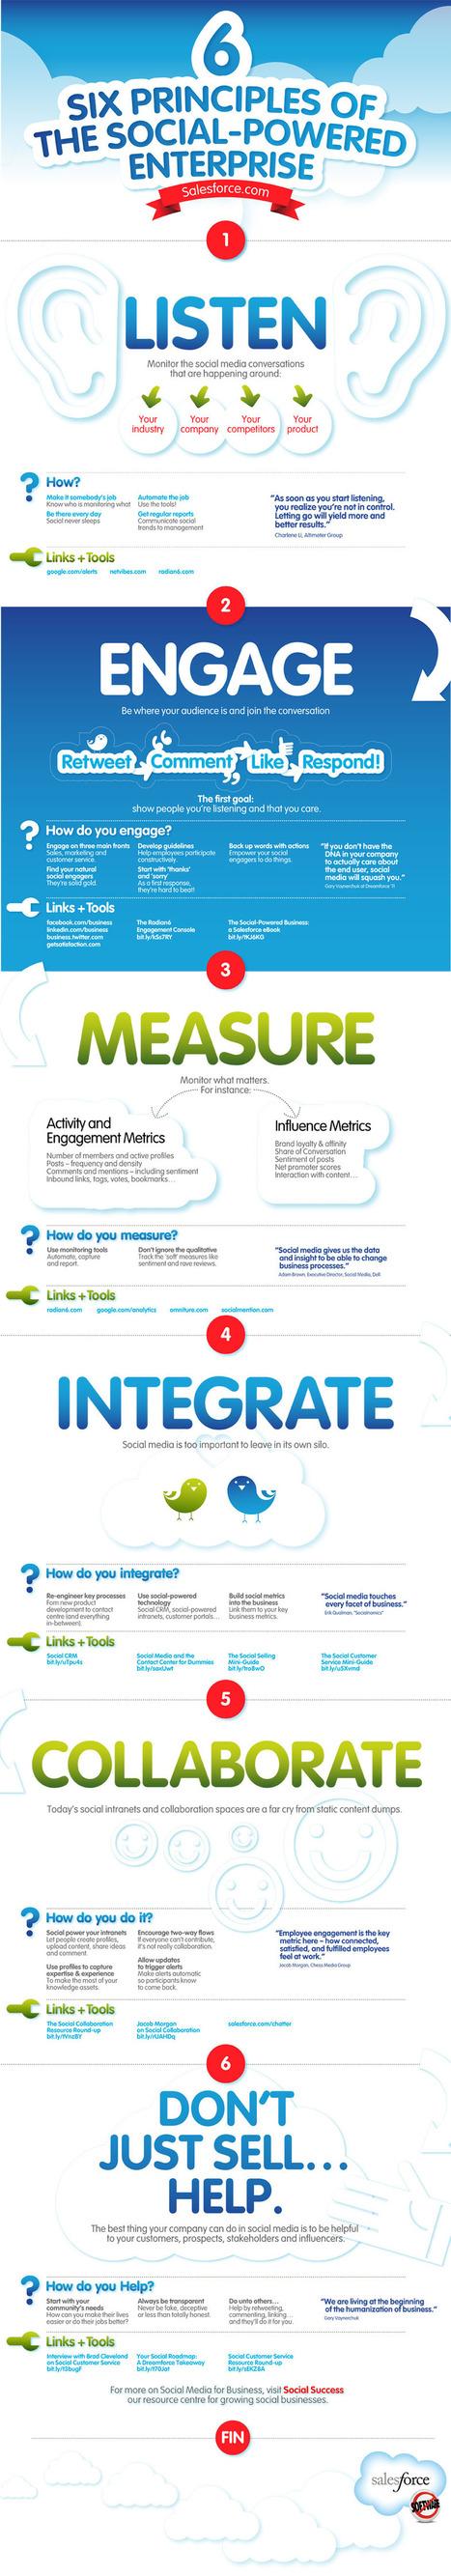 Six Principles of the Social-Powered Enterprise [Infographic] | ten Hagen on Apple | Scoop.it